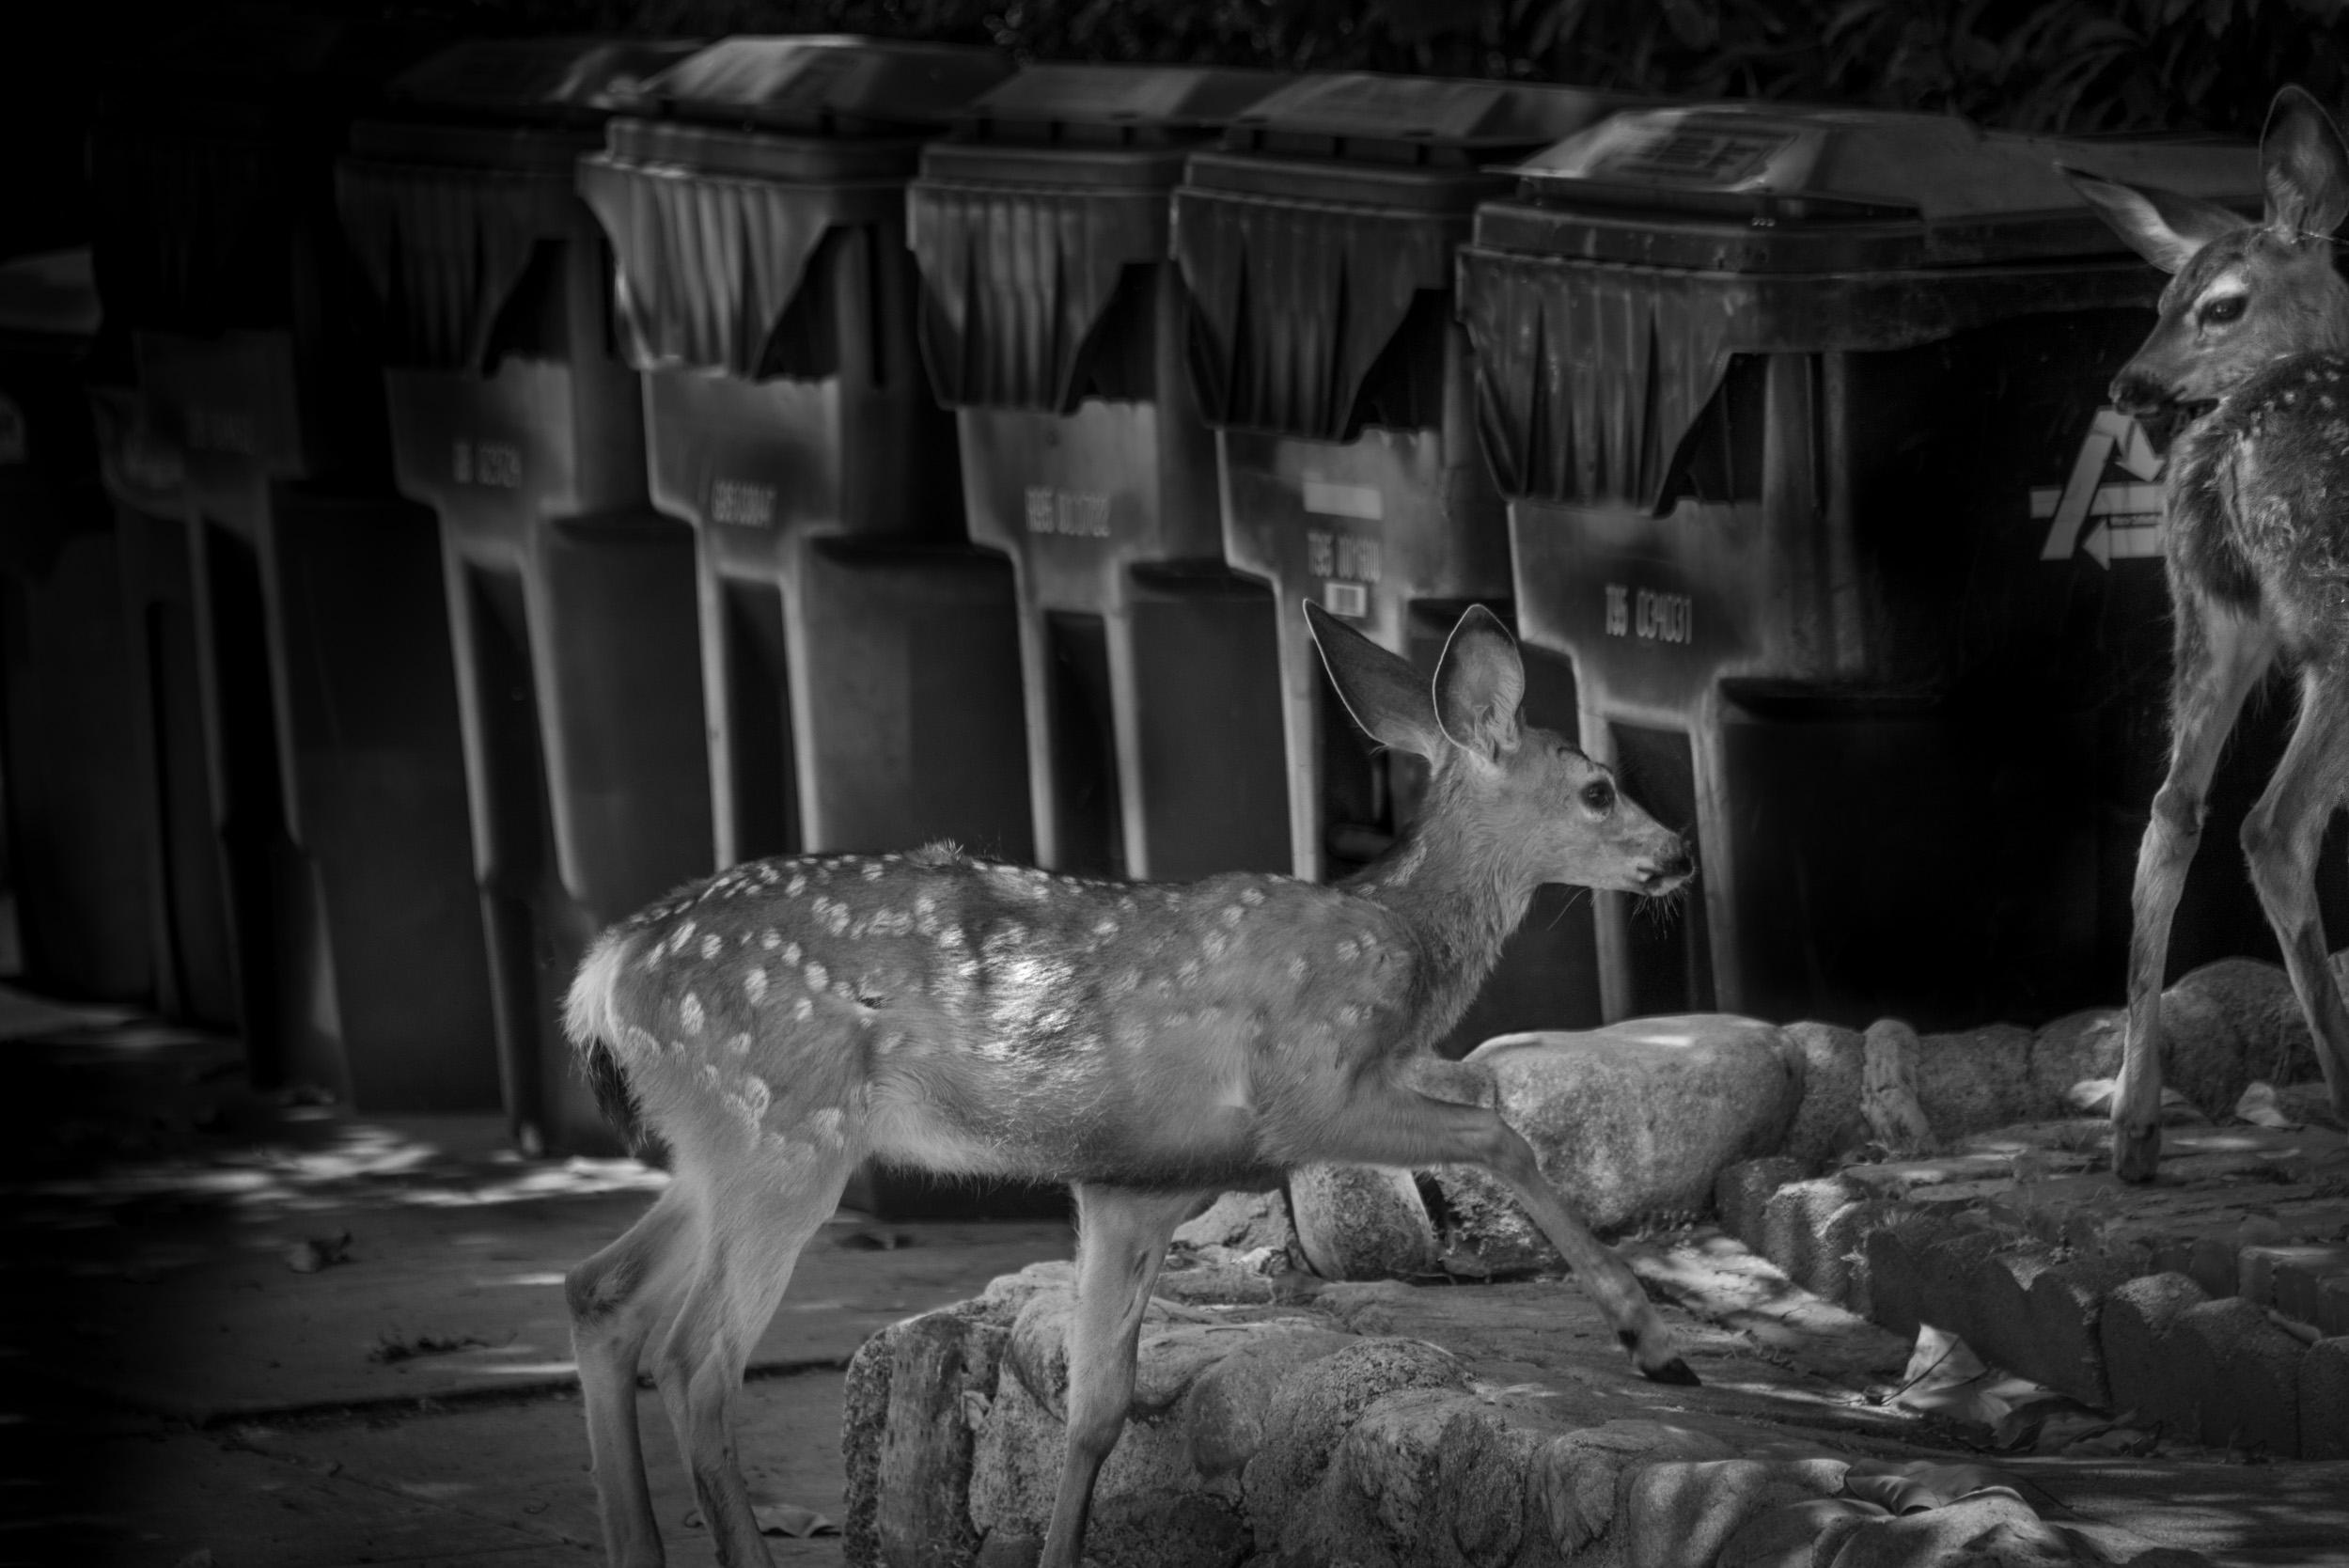 Deer and Trash Cans, Monrovia, California  © Robert Welkie 2019